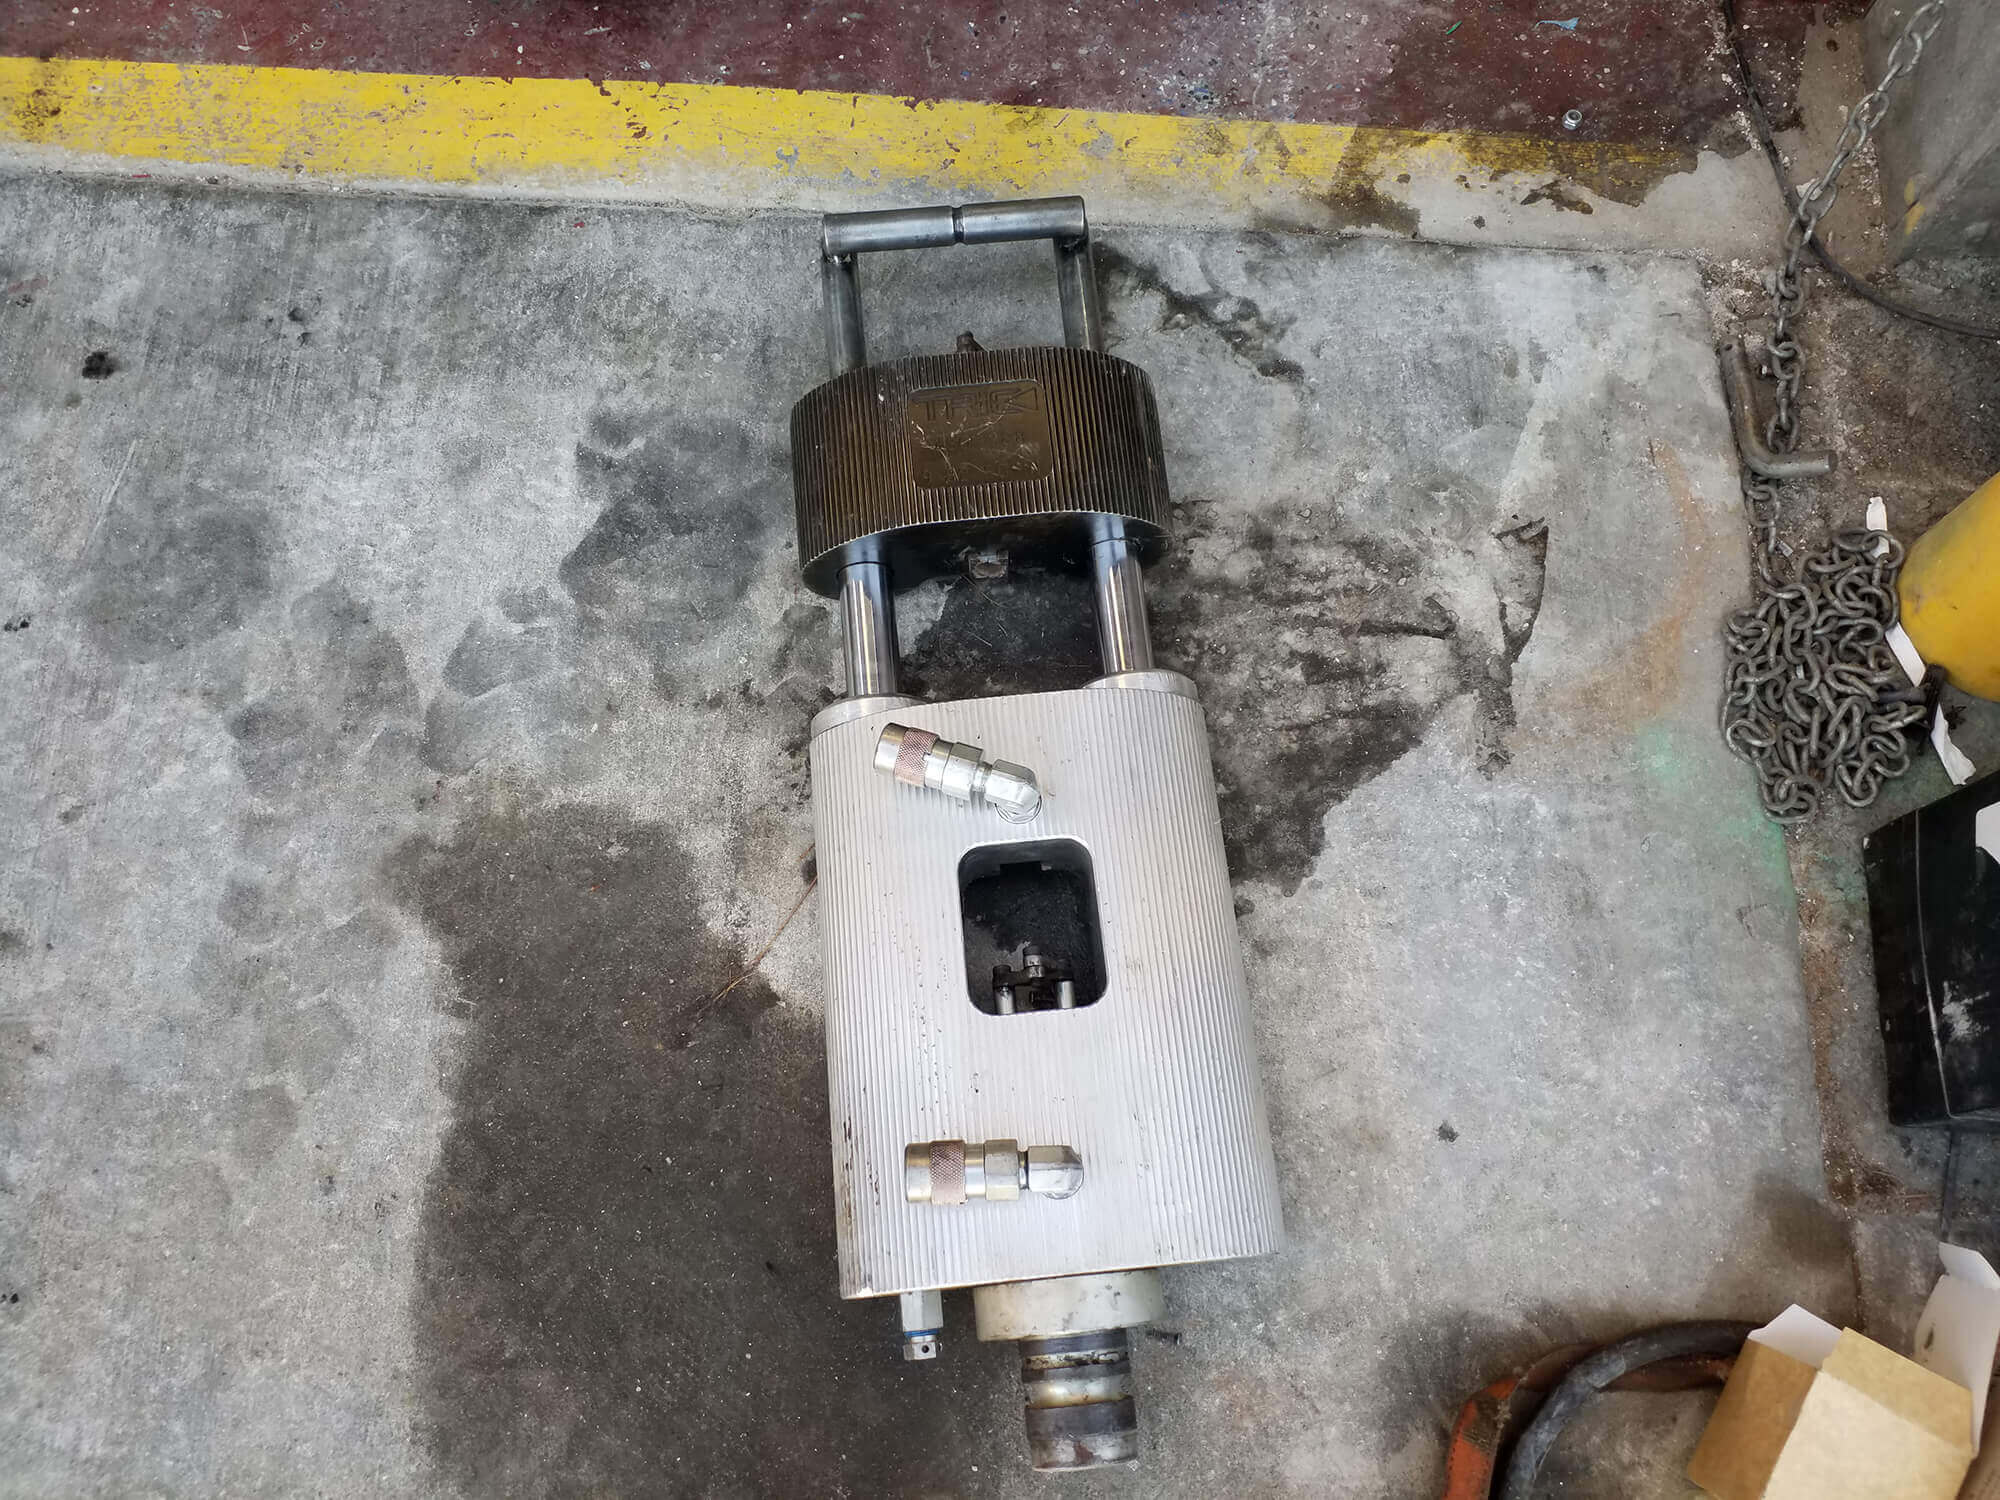 Tric Hydraulic Ram Repair - Trenchless Equipment Service & Repair